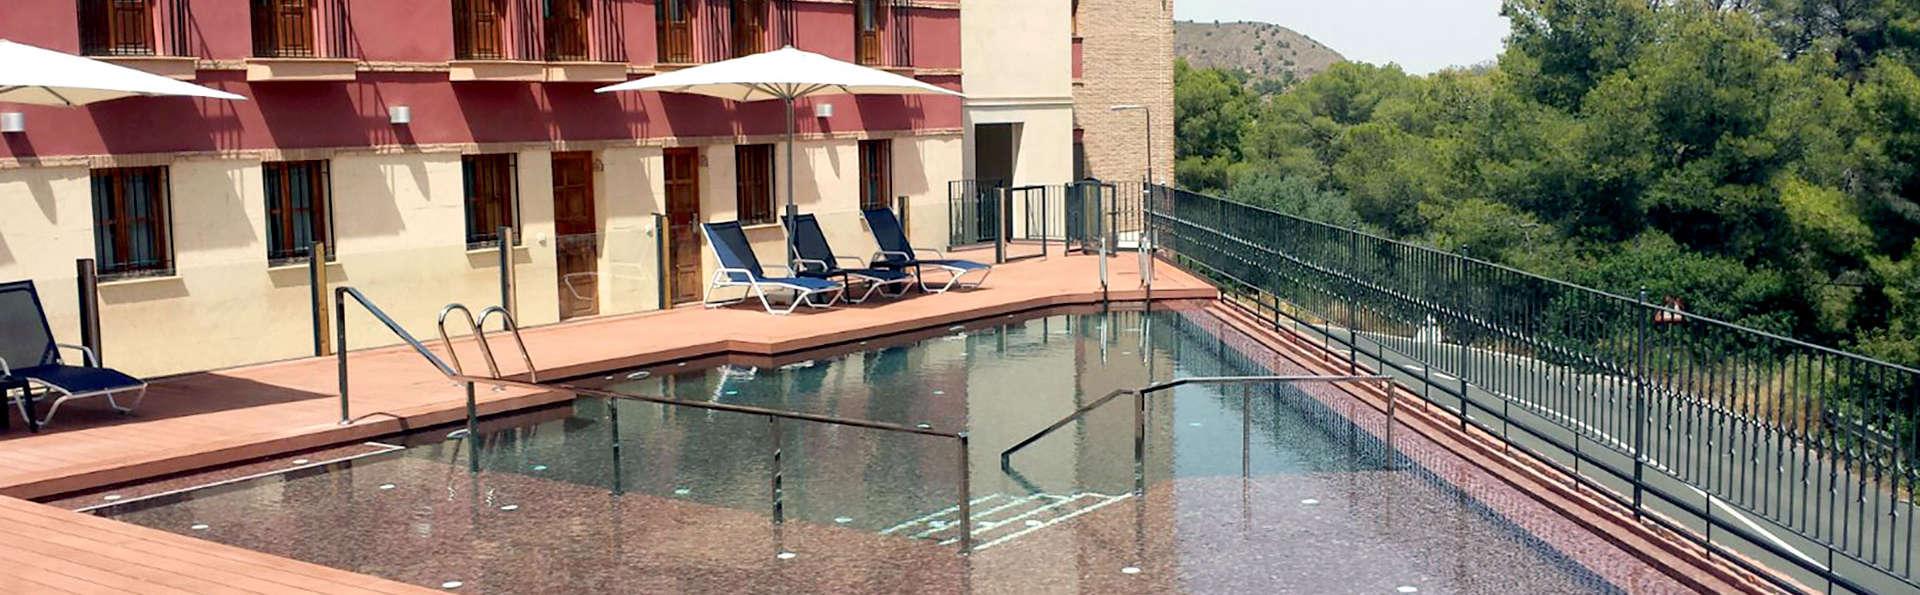 Hotel Jardines de la Santa - EDIT_NEW_POOL.jpg